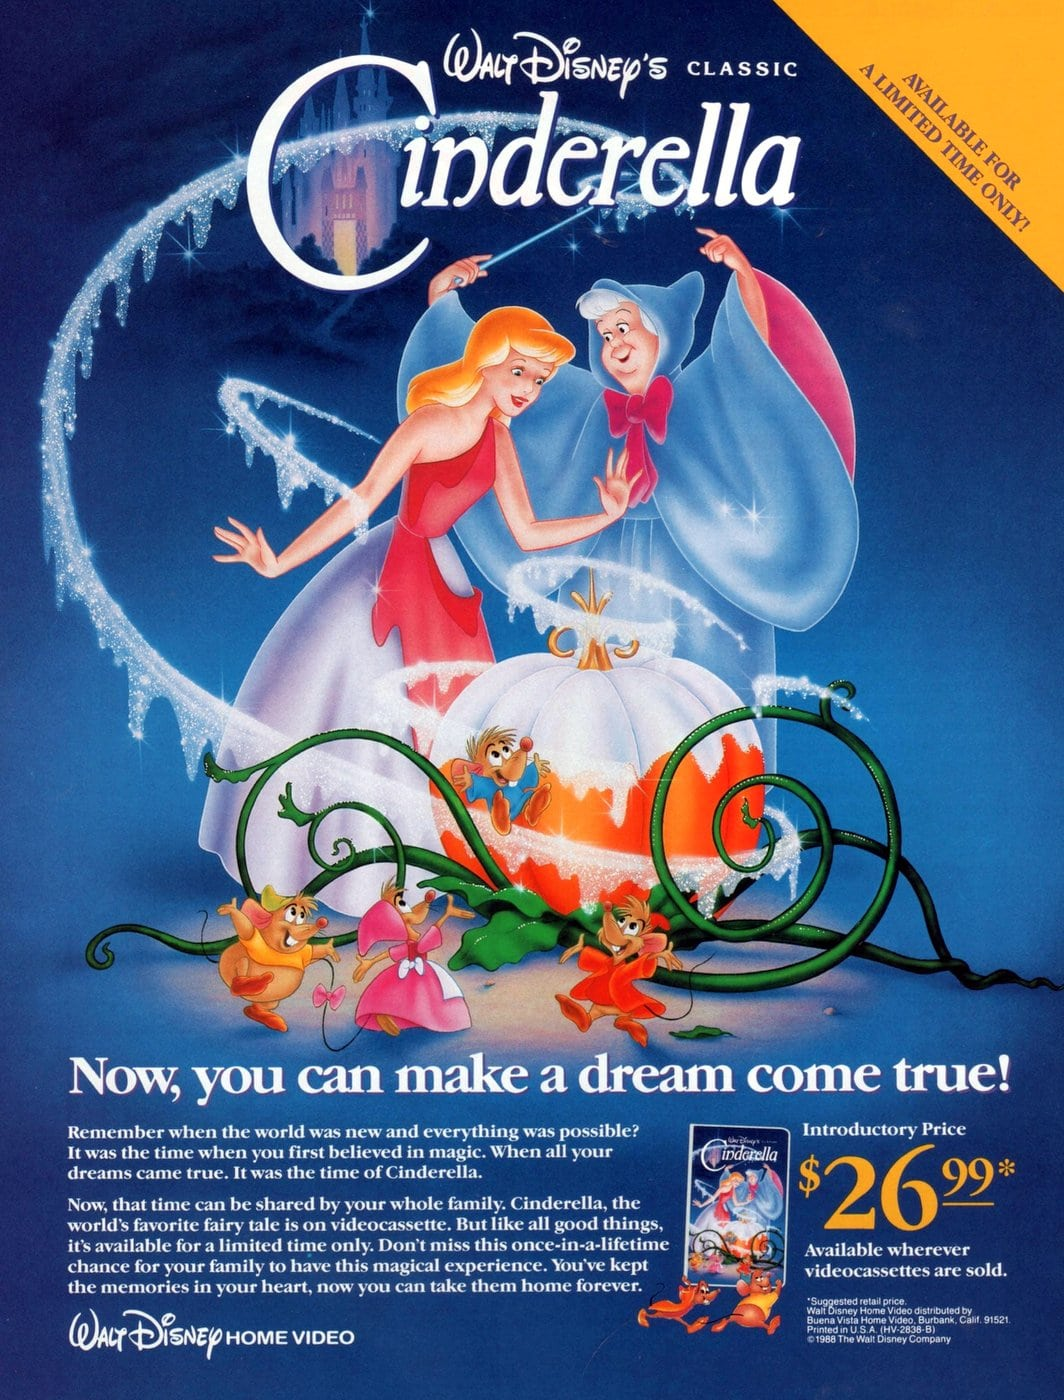 Walt Disney's classic Cinderella (1987)